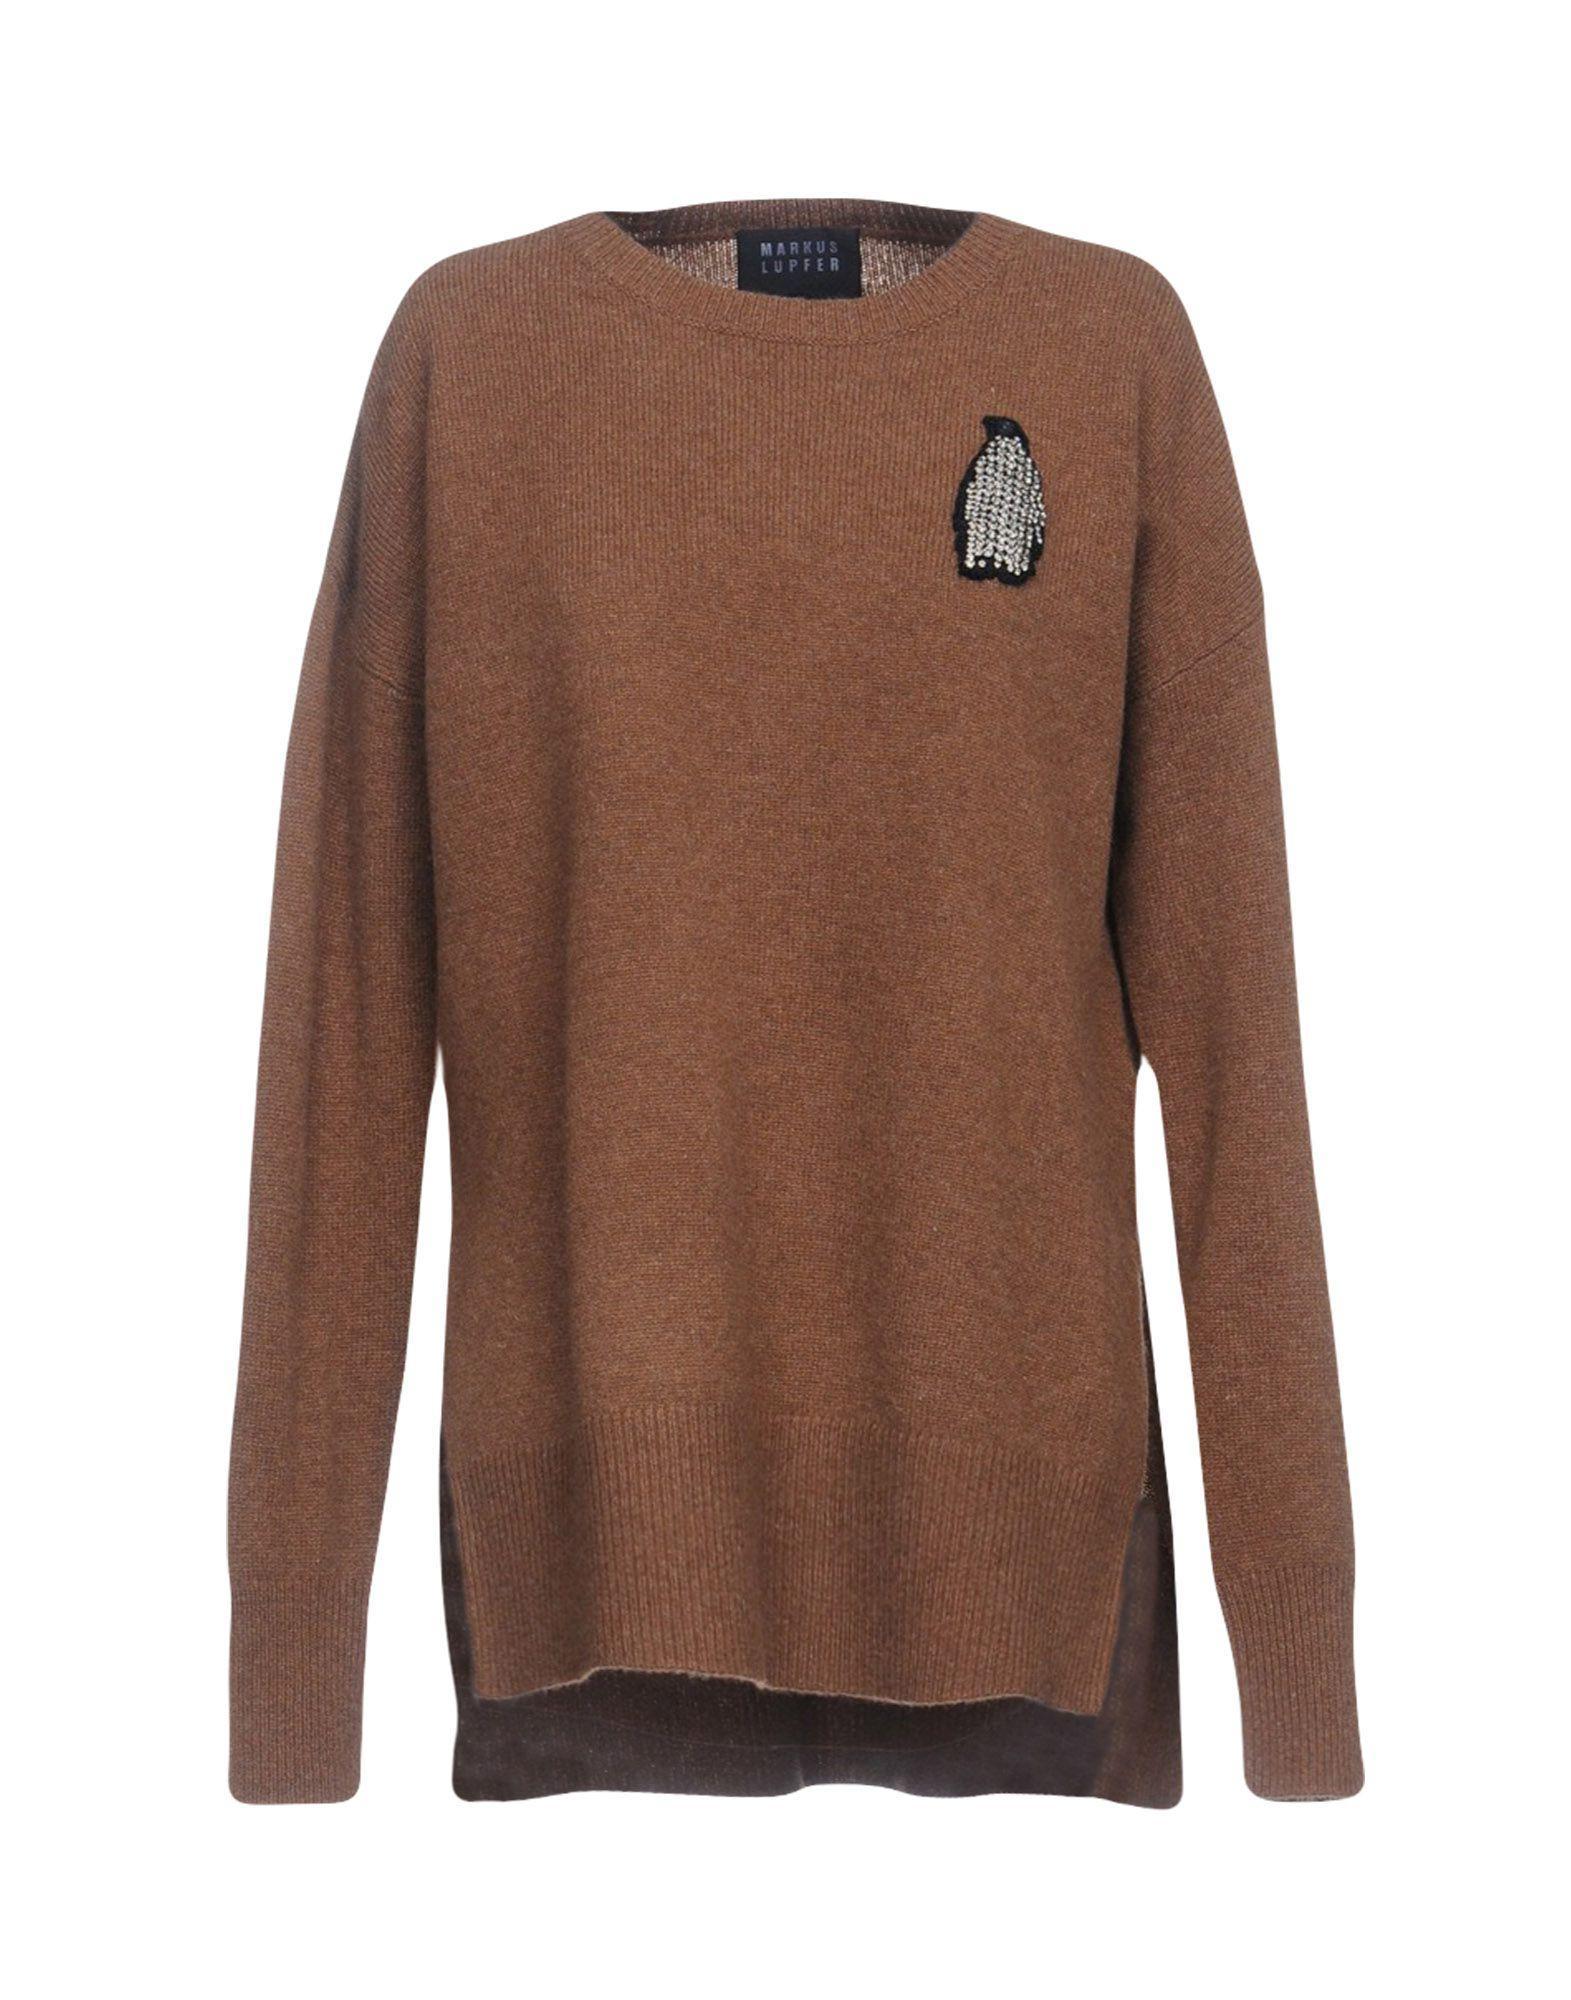 Markus Lupfer Sweater In Khaki